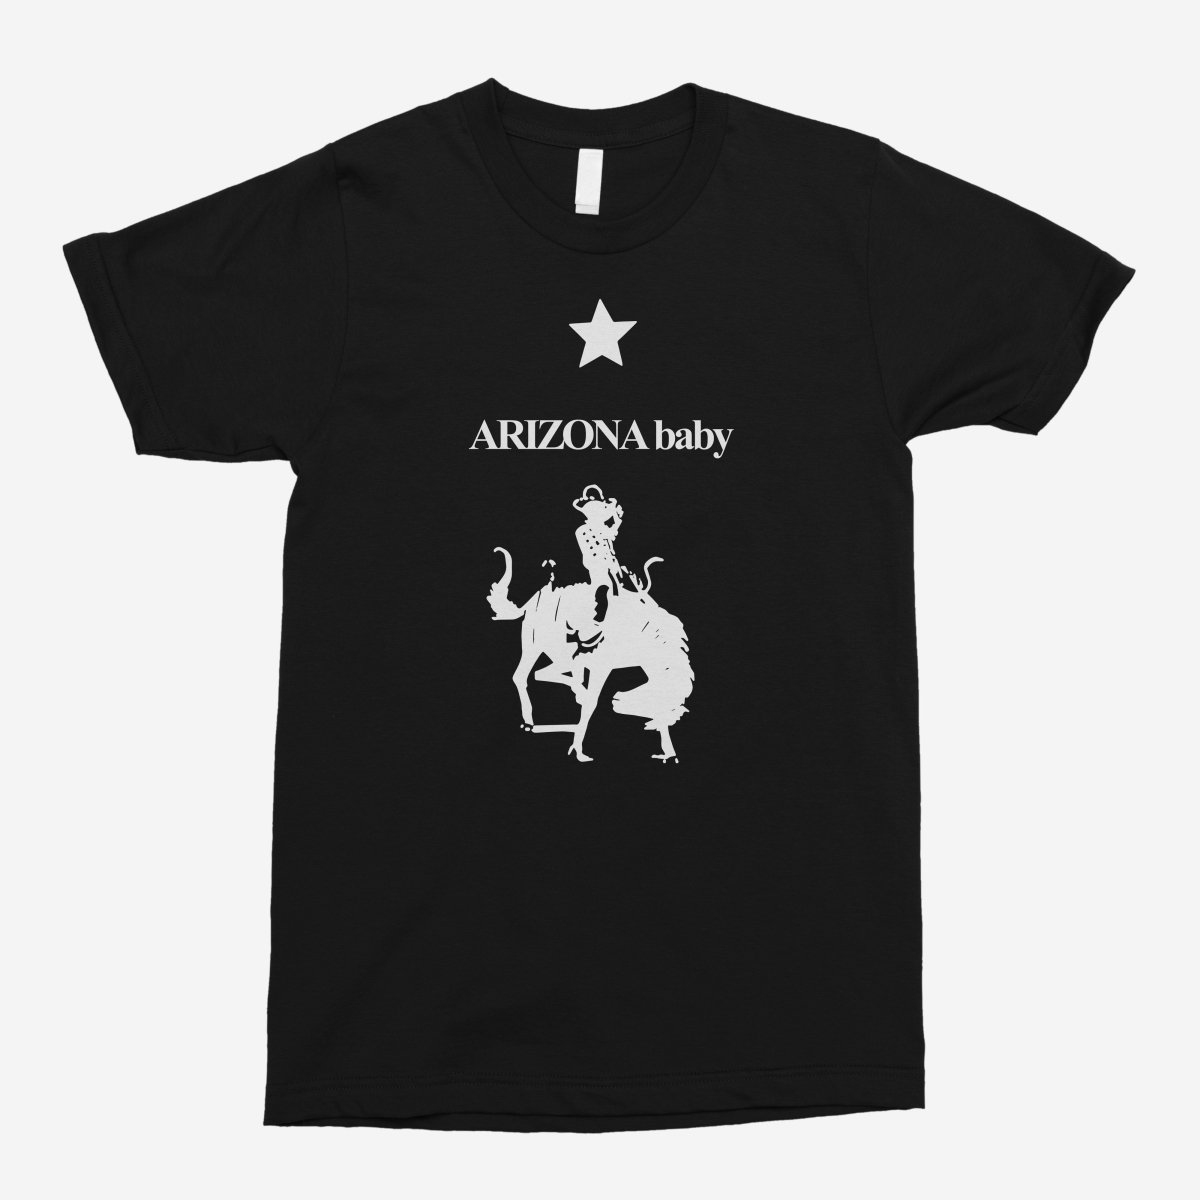 Kevin Abstract - Arizona Baby Unisex T-Shirt